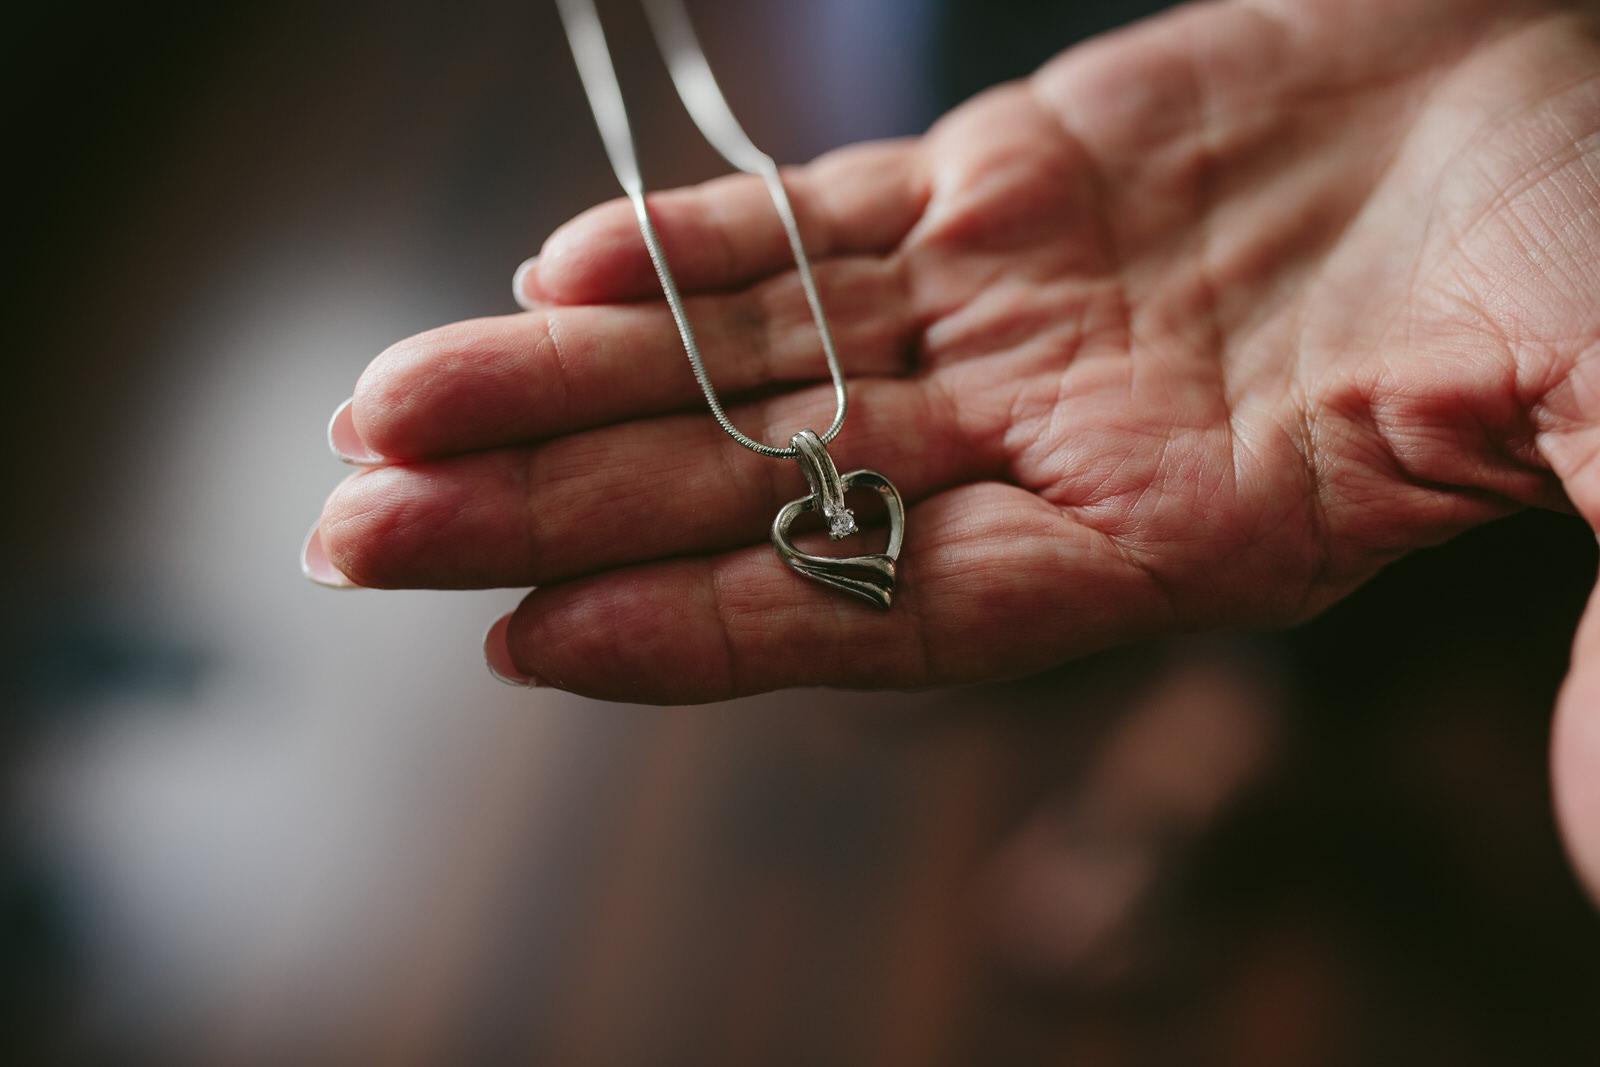 mom-holding-necklace-tiny-house-photo-intimate-wedding-portraits.jpg